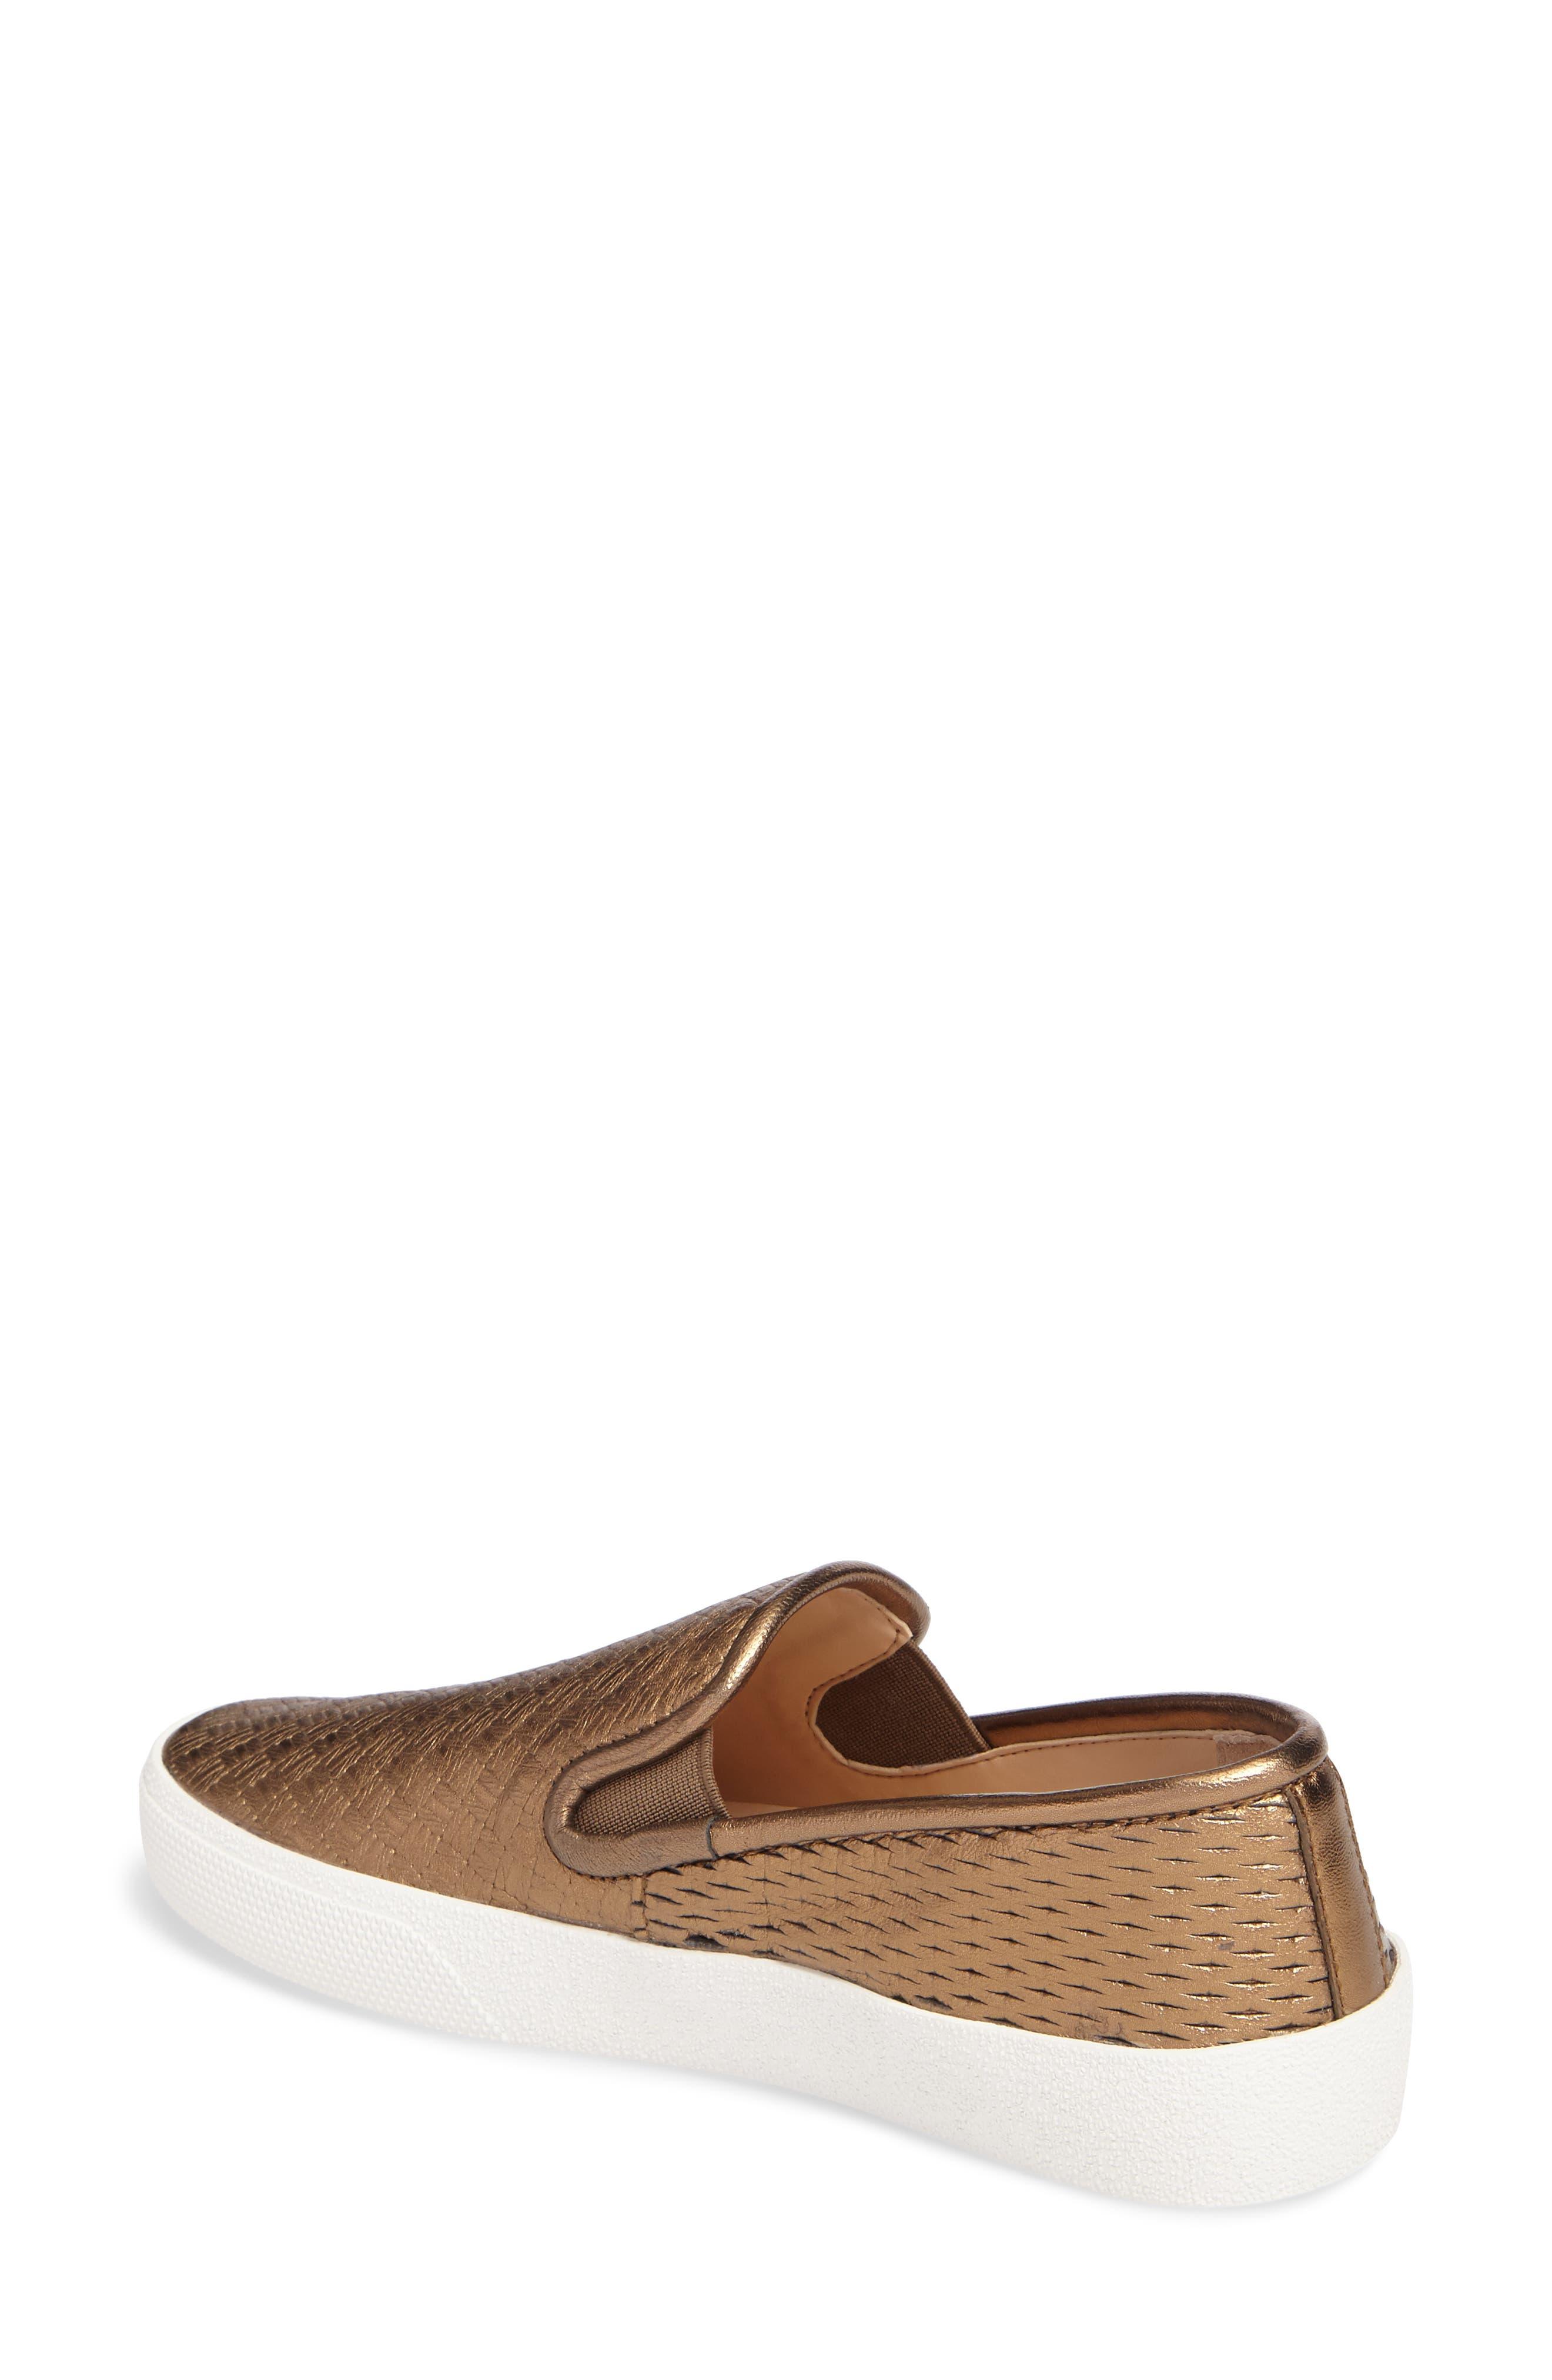 Alternate Image 2  - Vince Camuto Cariana Slip-On Sneaker (Women)